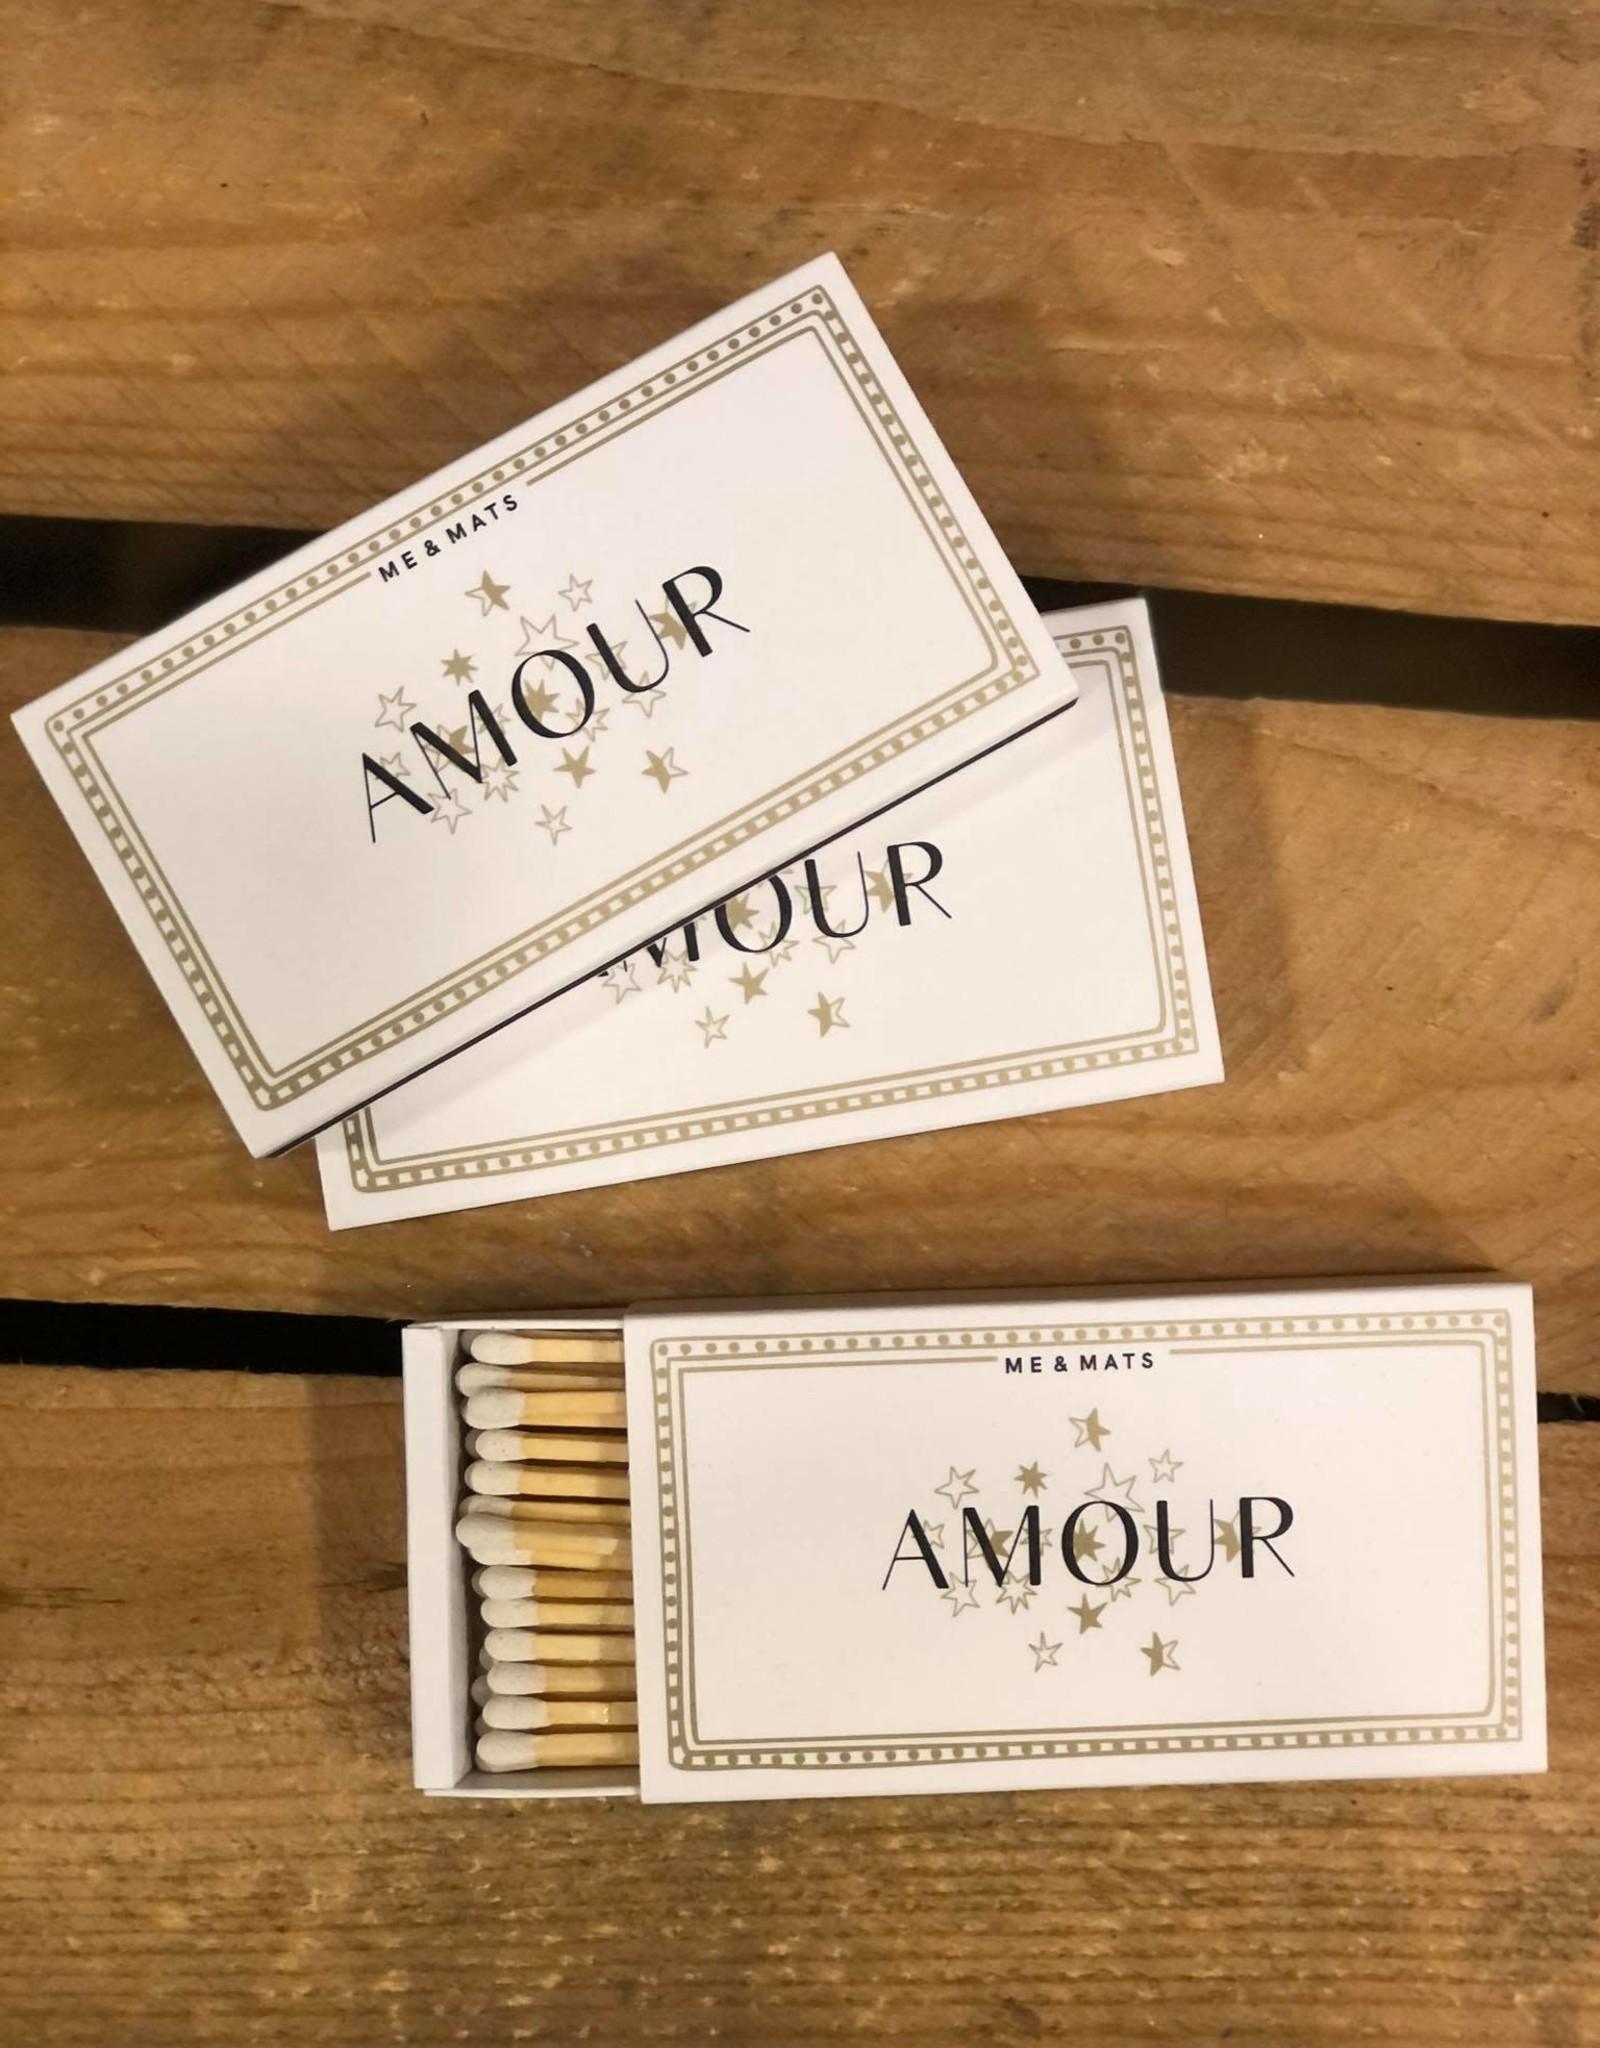 ME&MATS Matches - Amour